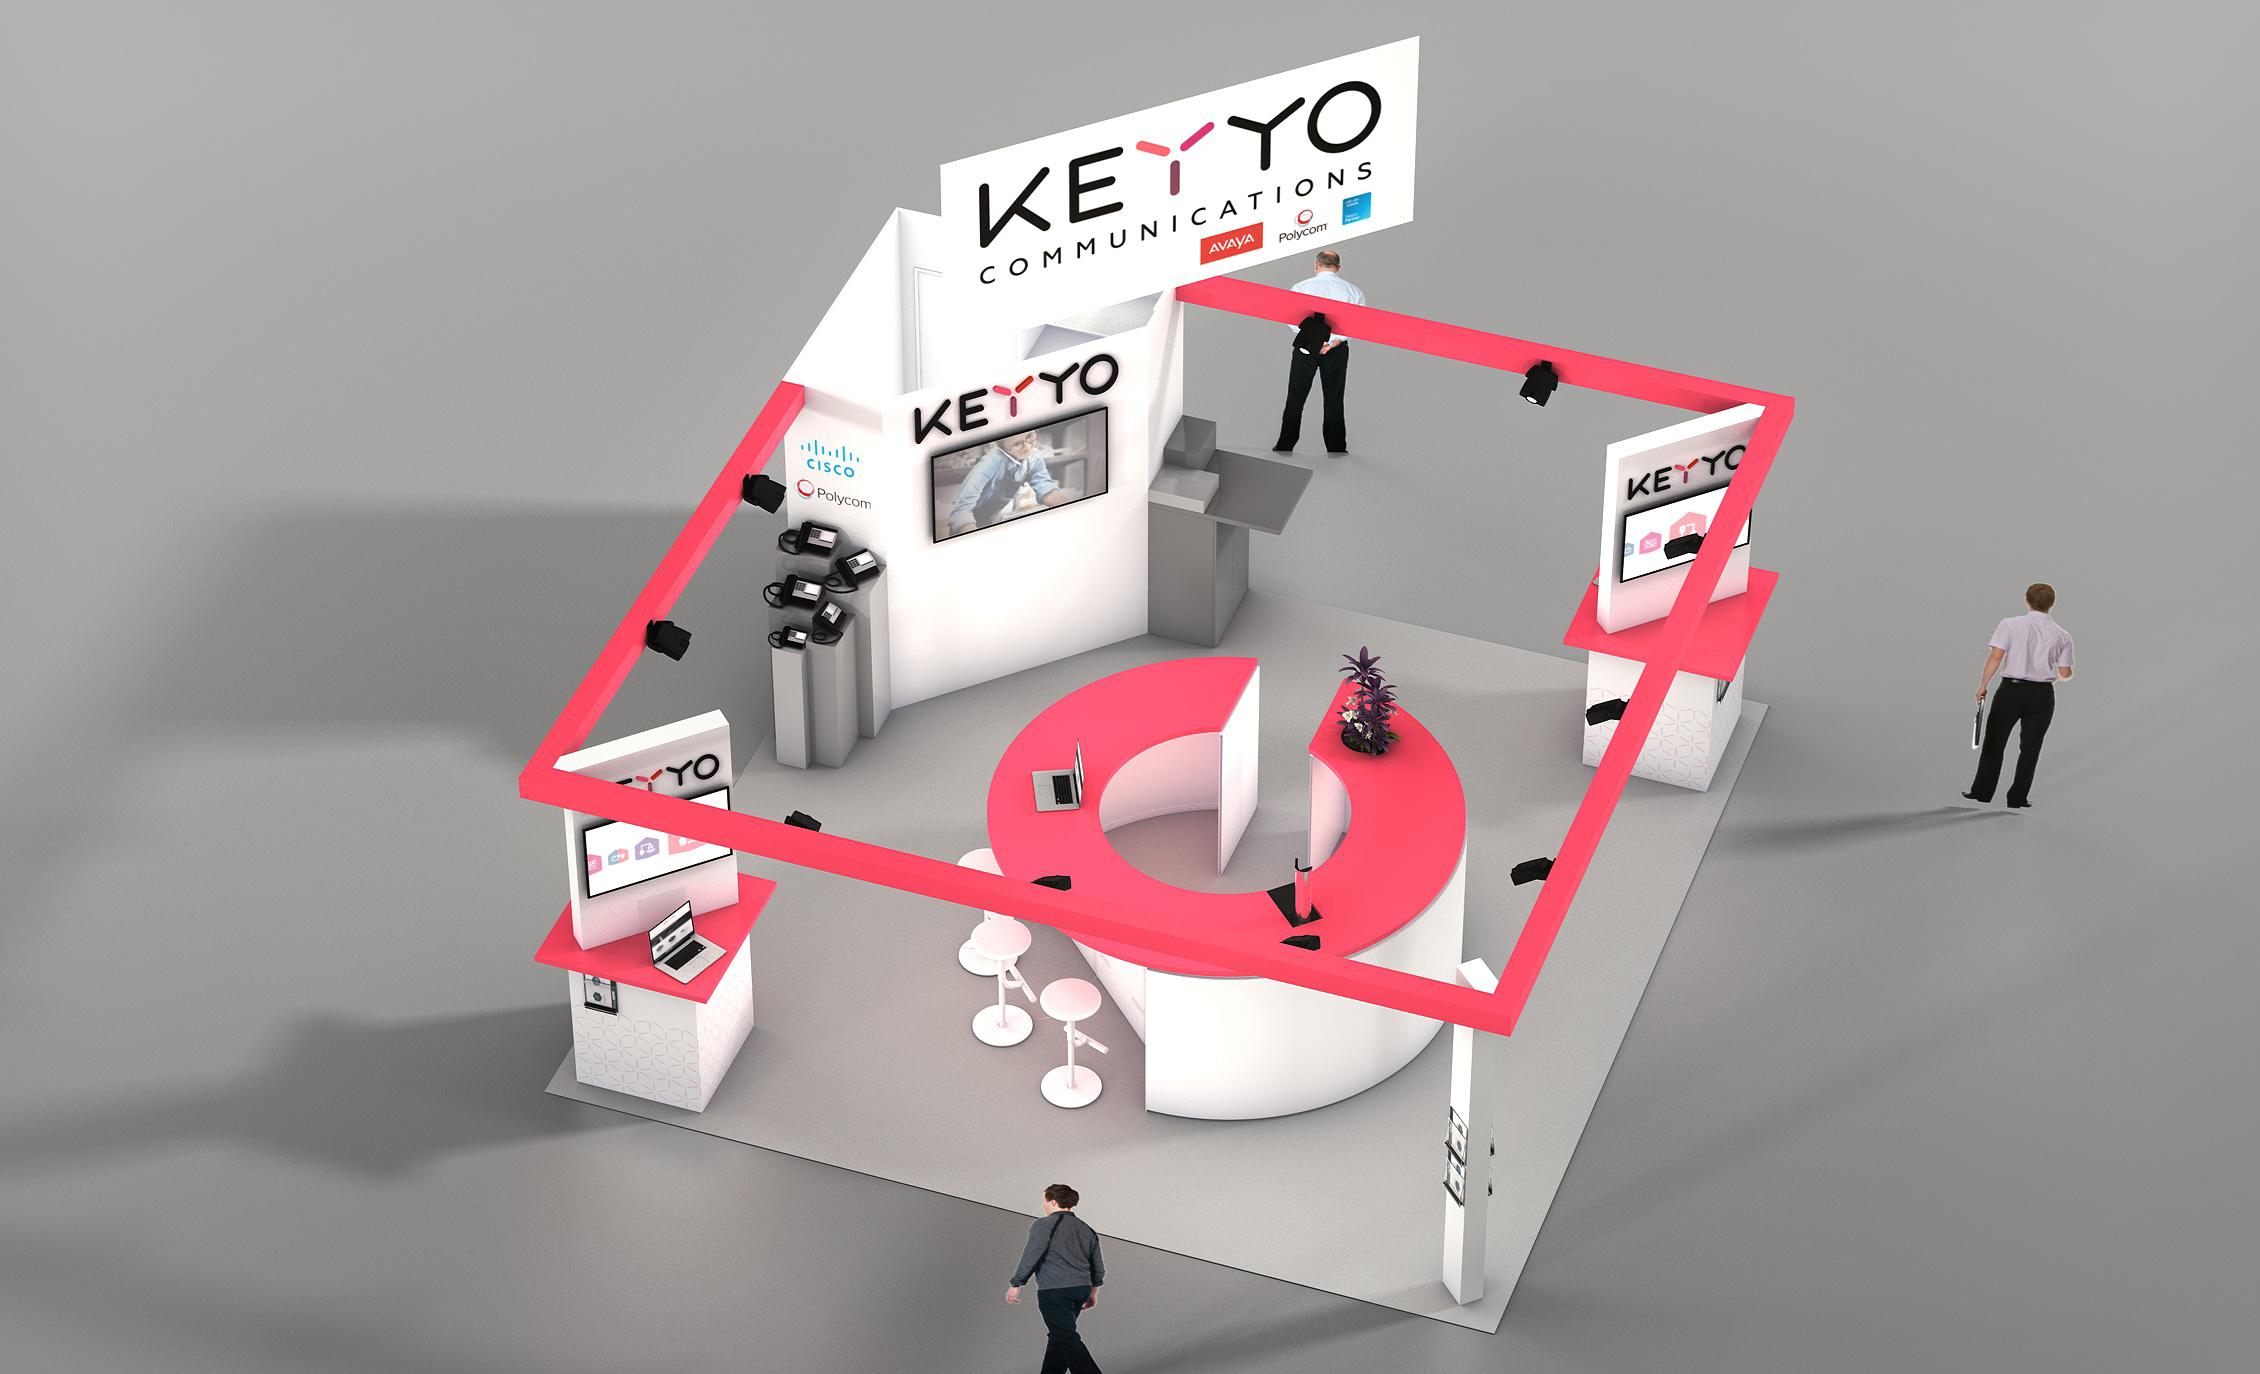 KEYYO_0110_D1.jpg